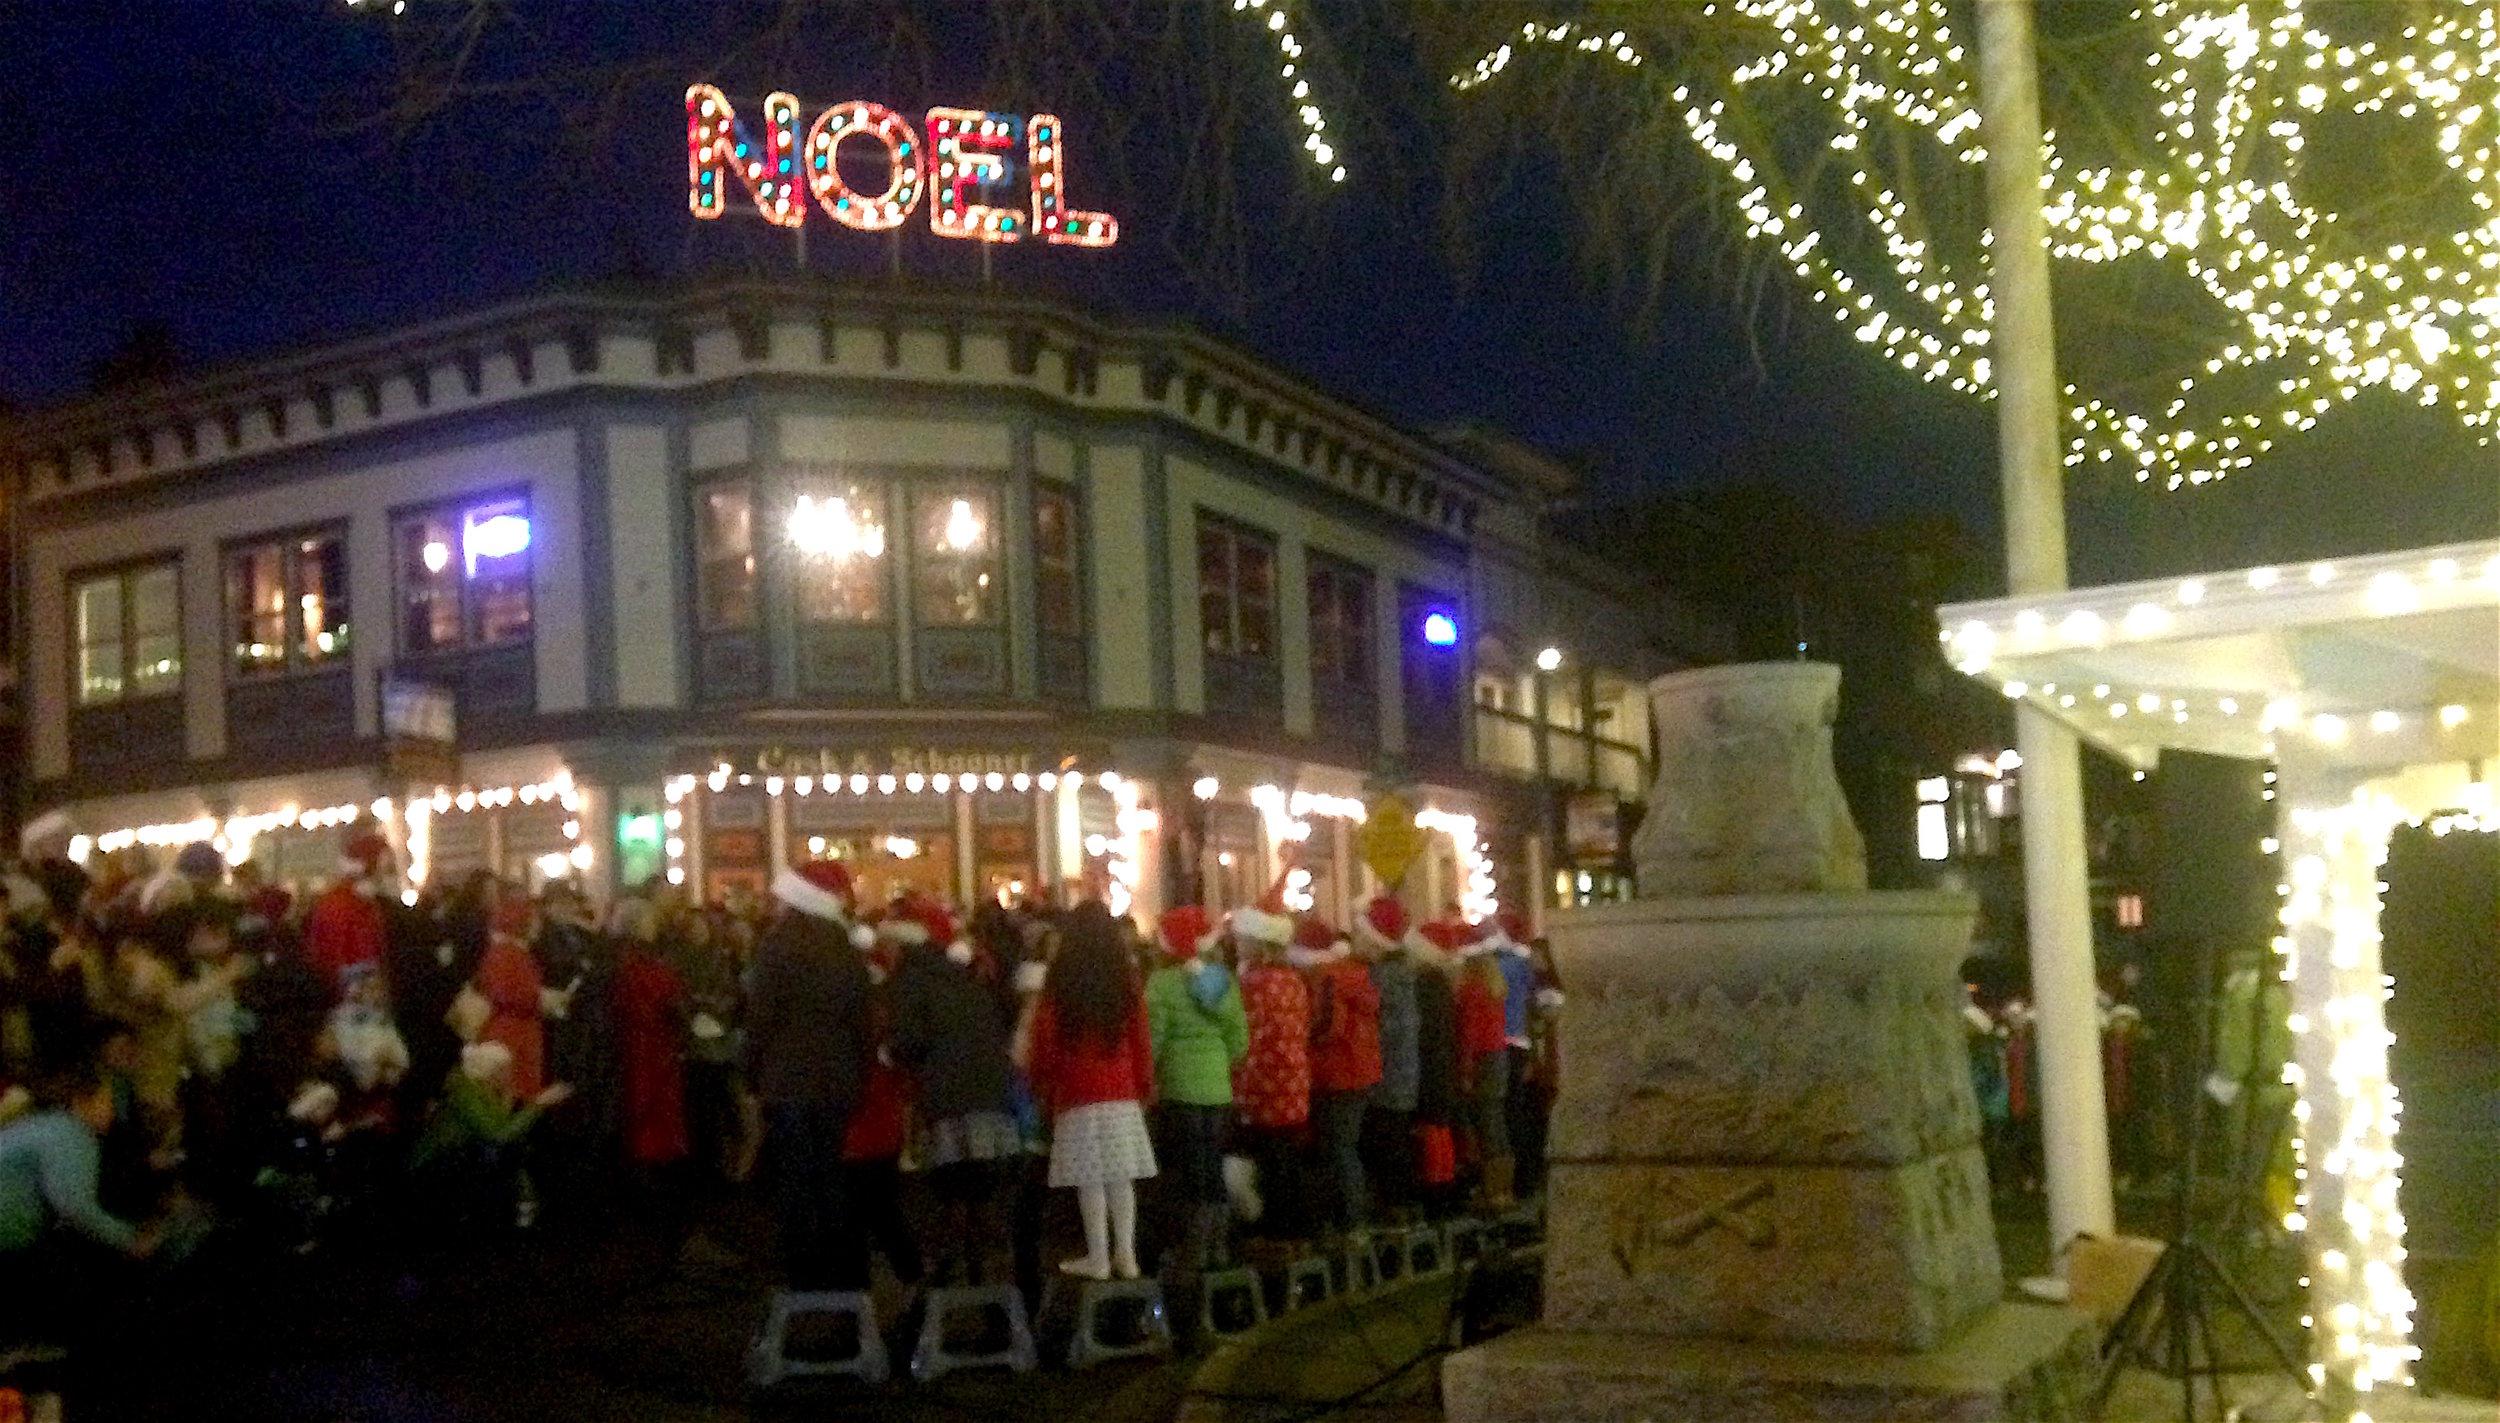 Tree Lighting Ceremony at Memorial Park in Friday Harbor